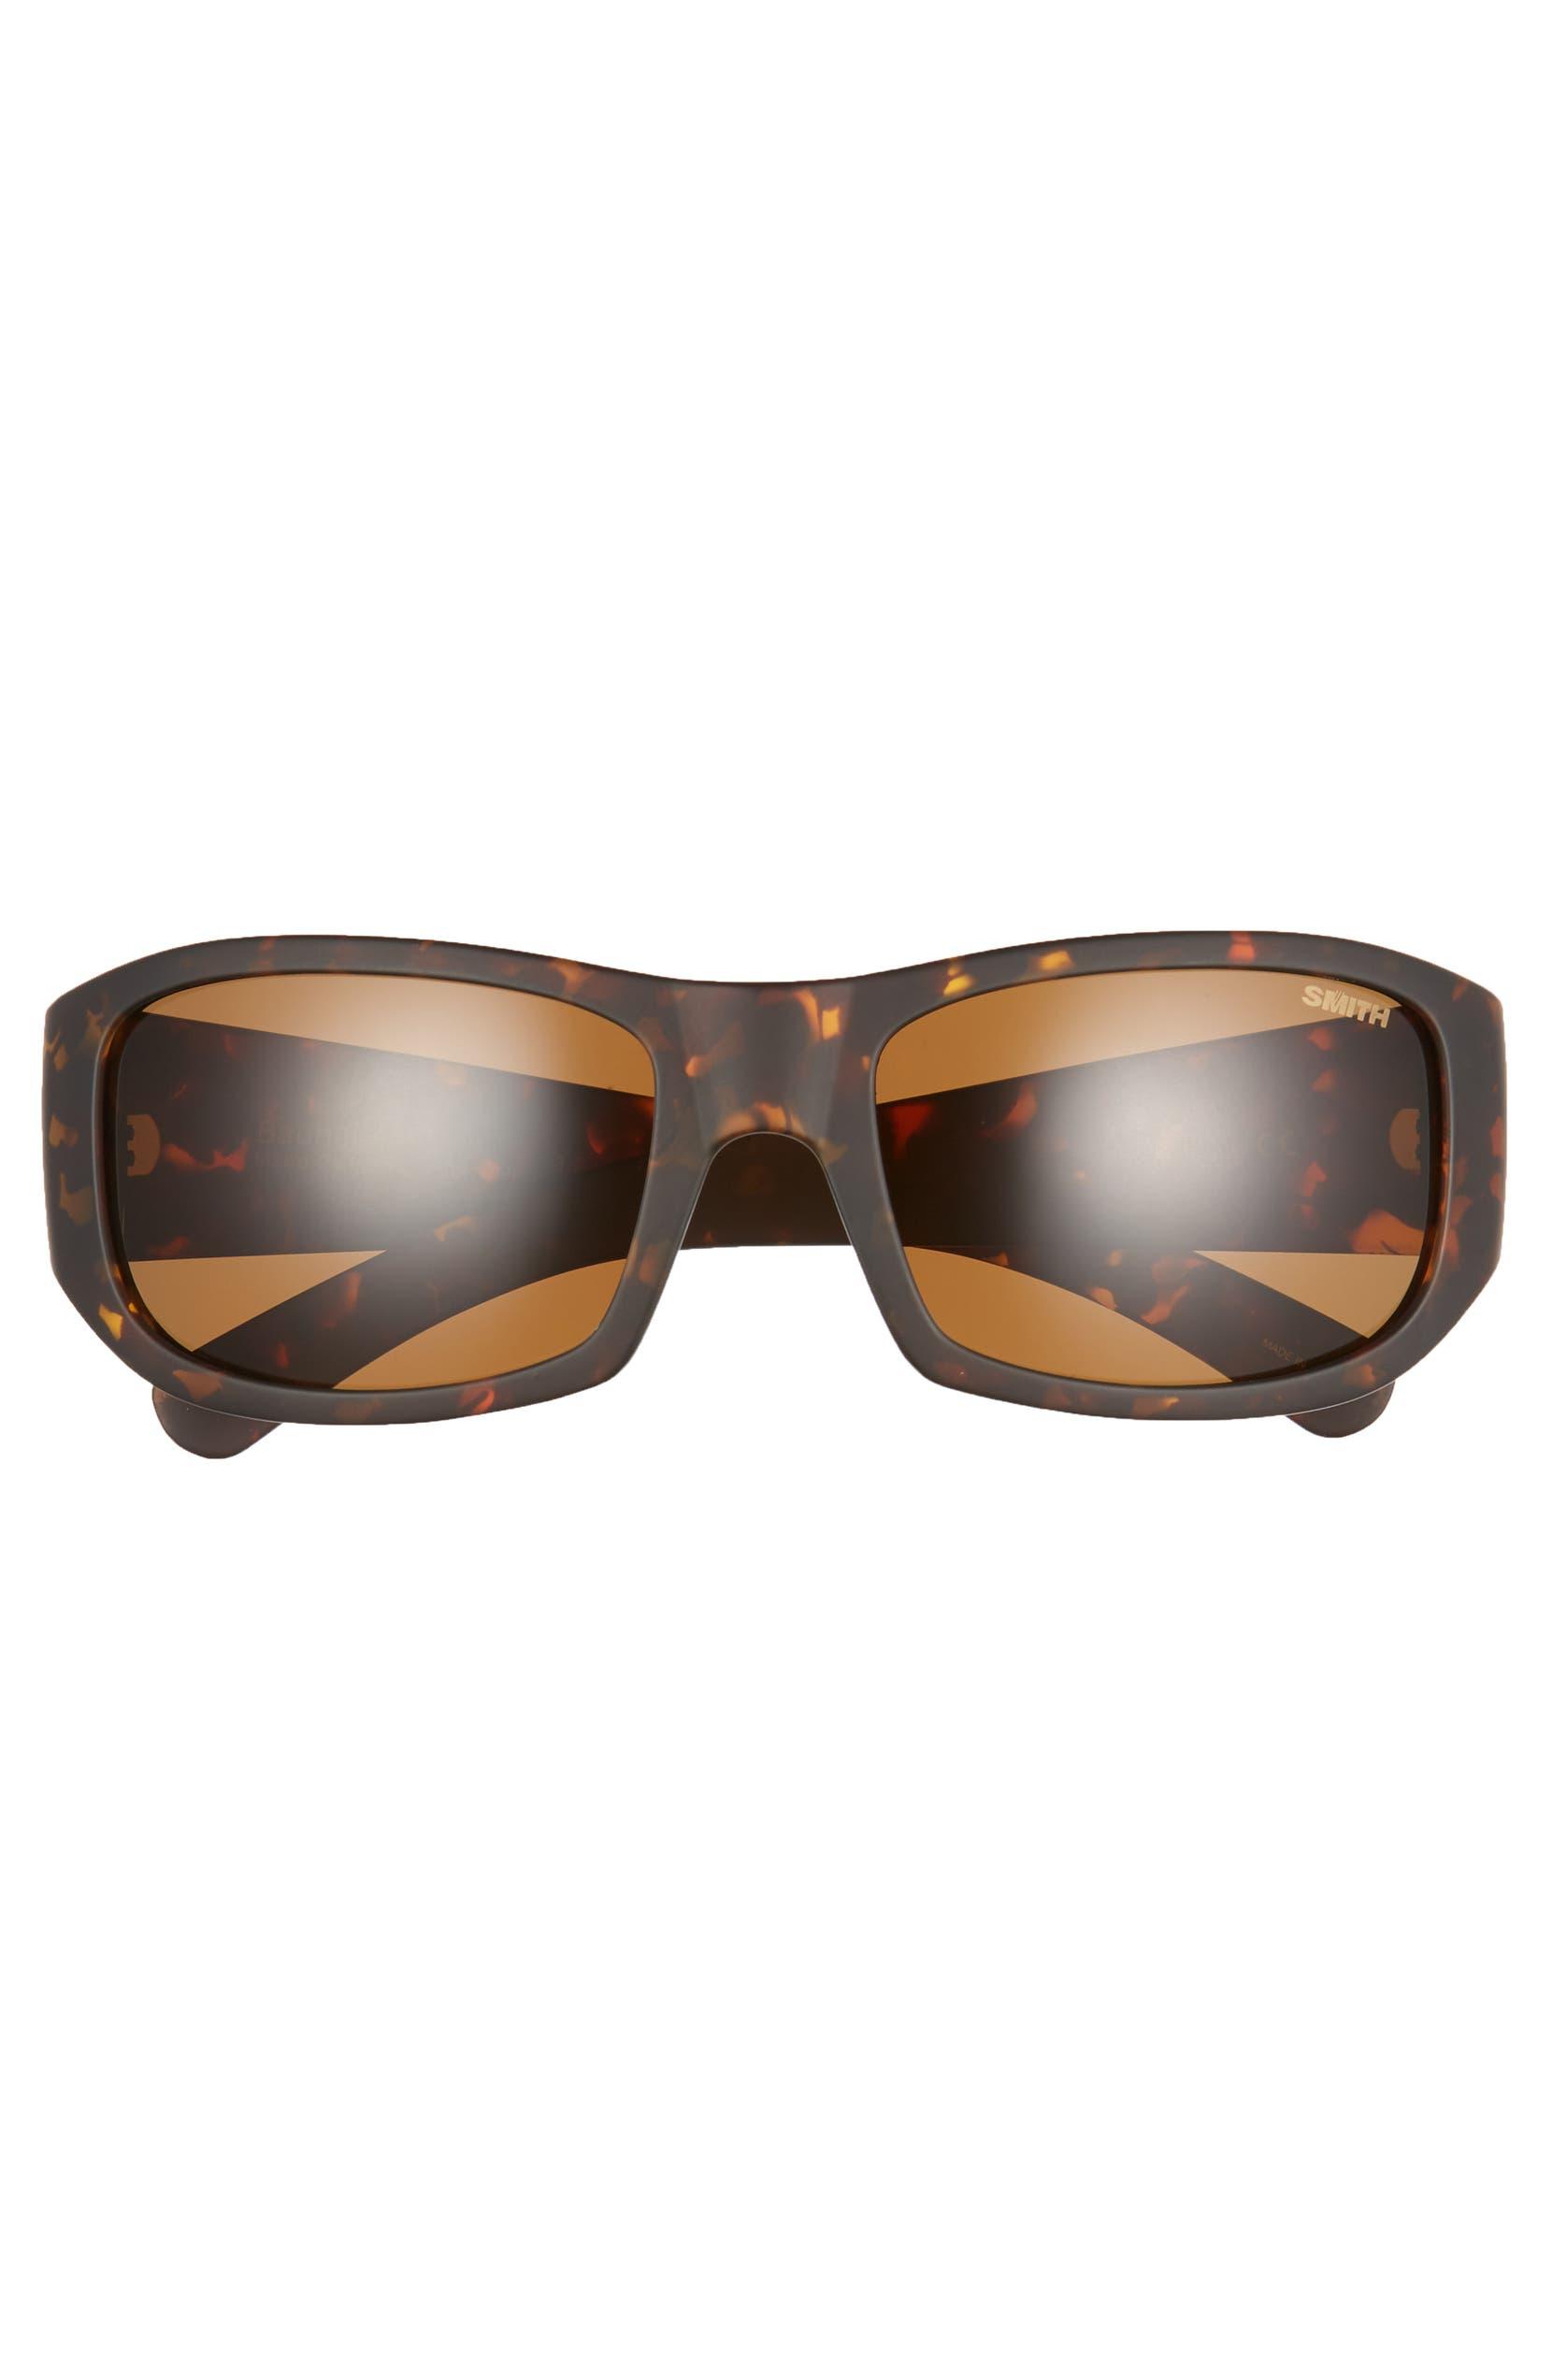 c508660c05 Smith Bauhaus 59mm ChromaPop™ Polarized Wraparound Sunglasses ...